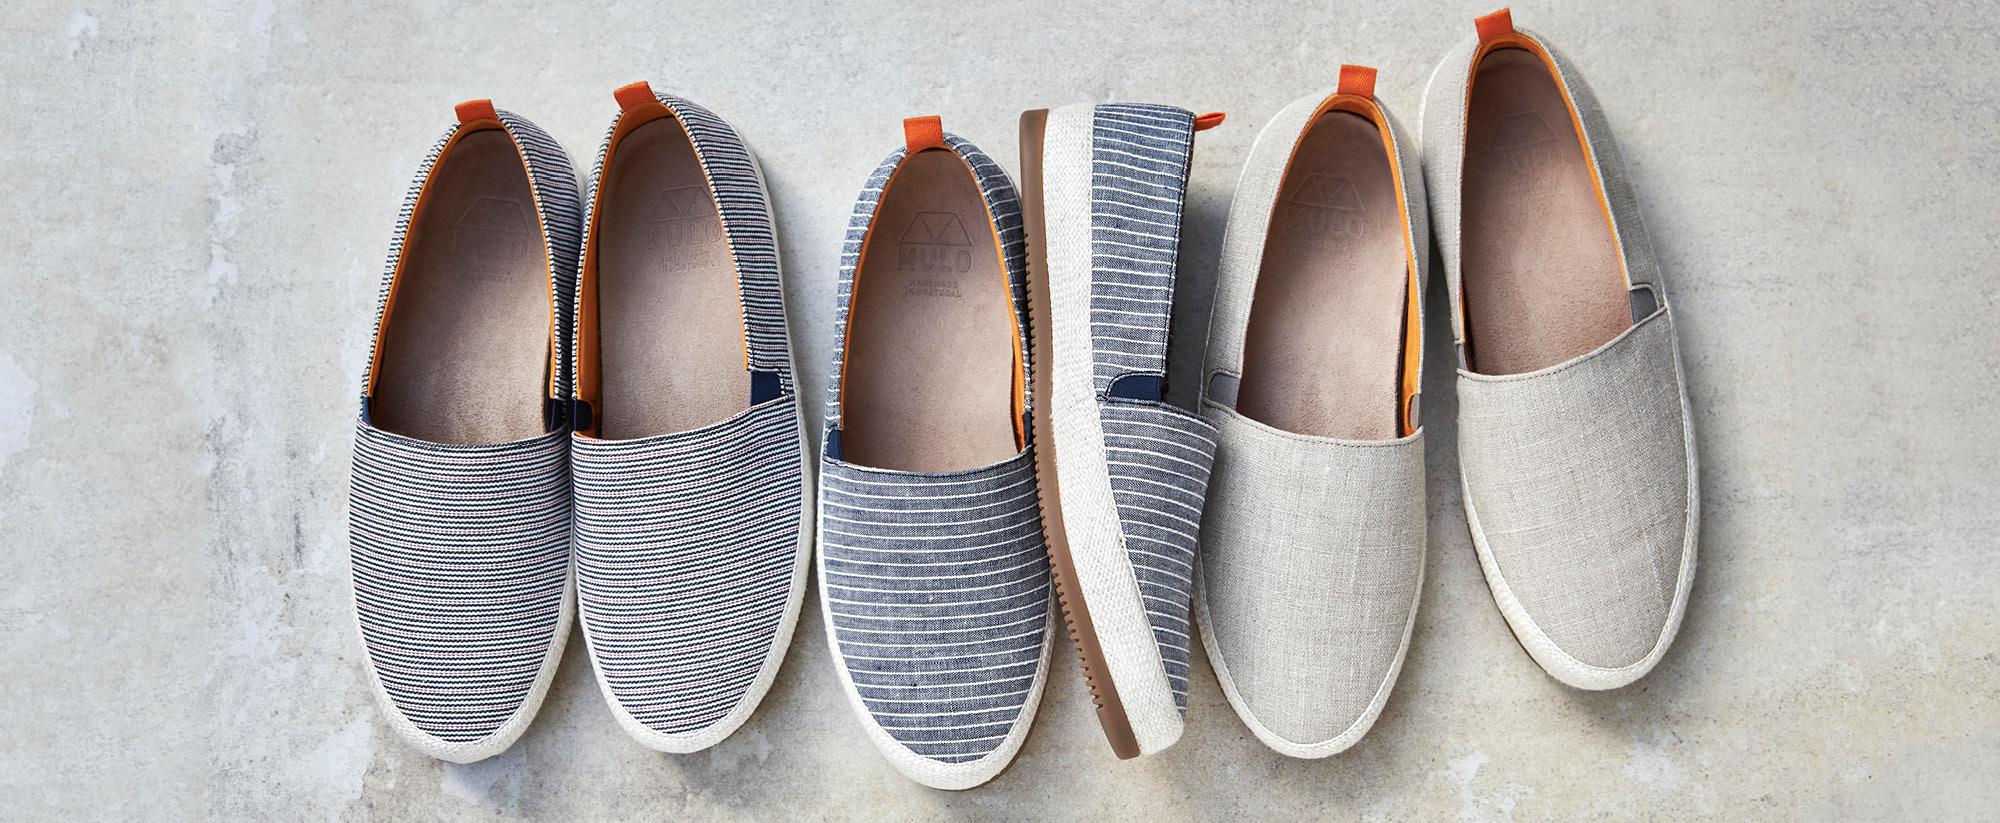 Mens shoes - Casual Shoes for Men